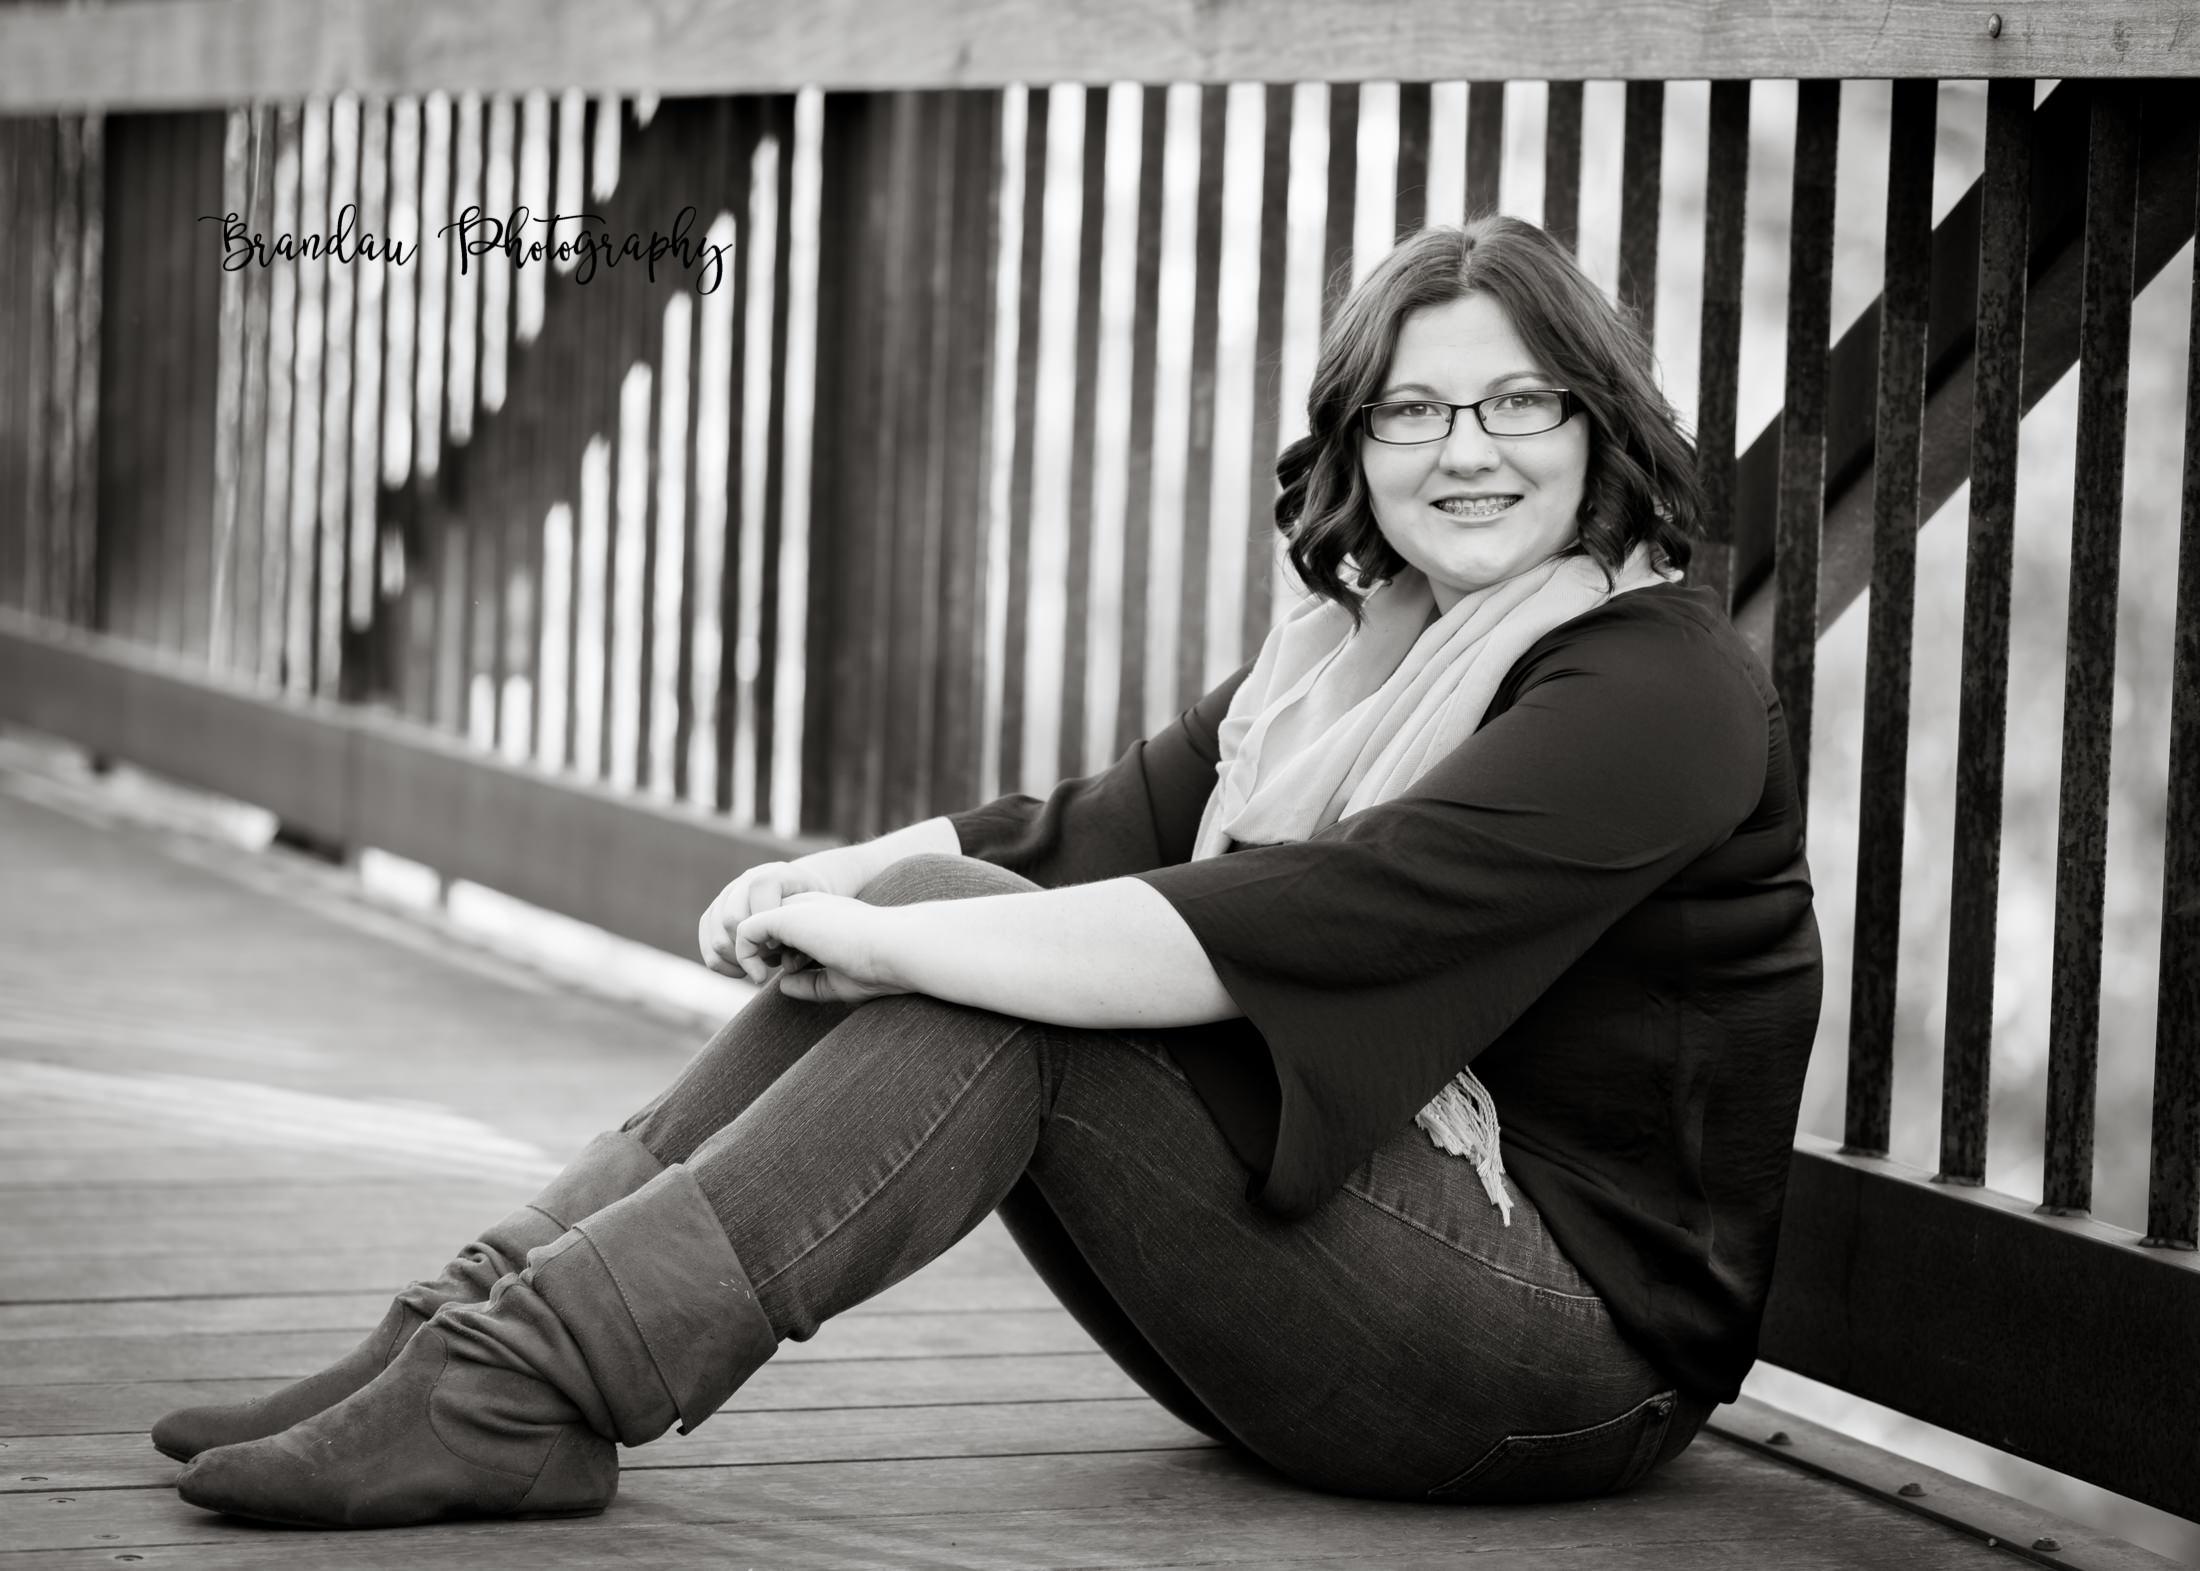 Central Iowa Senior - Brandau Photography - Ames Iowa